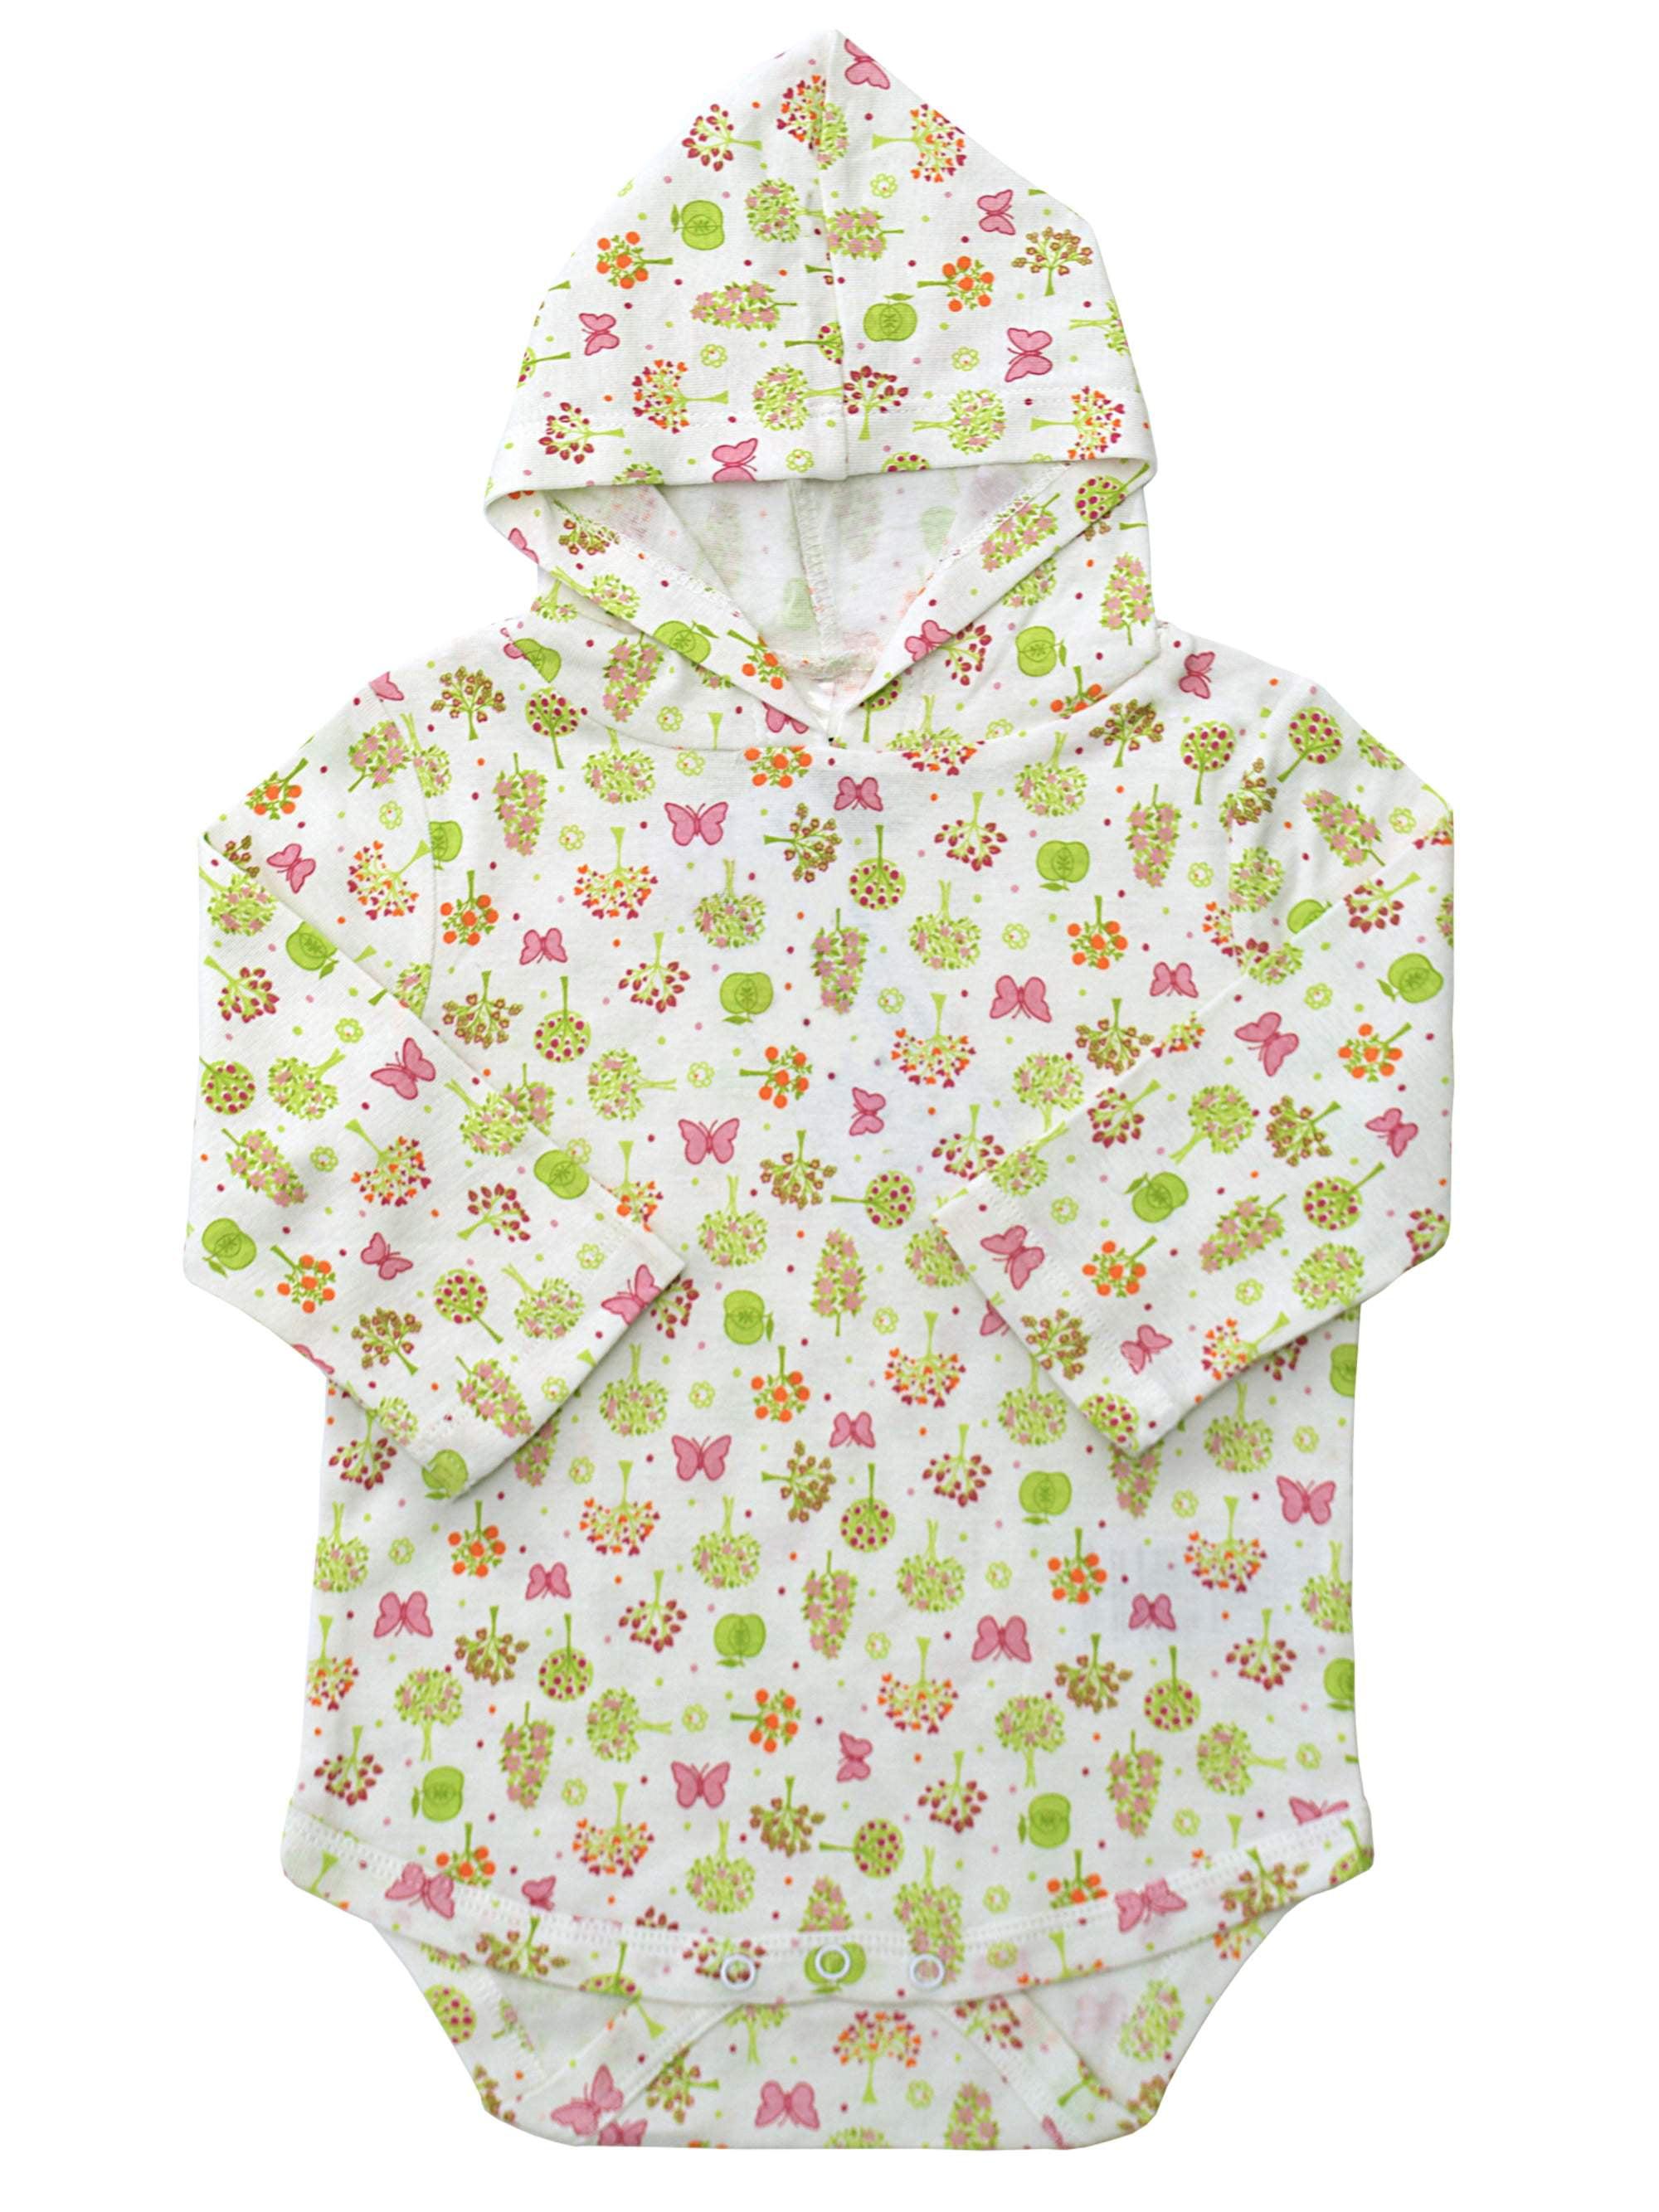 KidzStuff Long Sleeve Sun Protection Baby Bodysuit w/ Hood (Baby Girls)